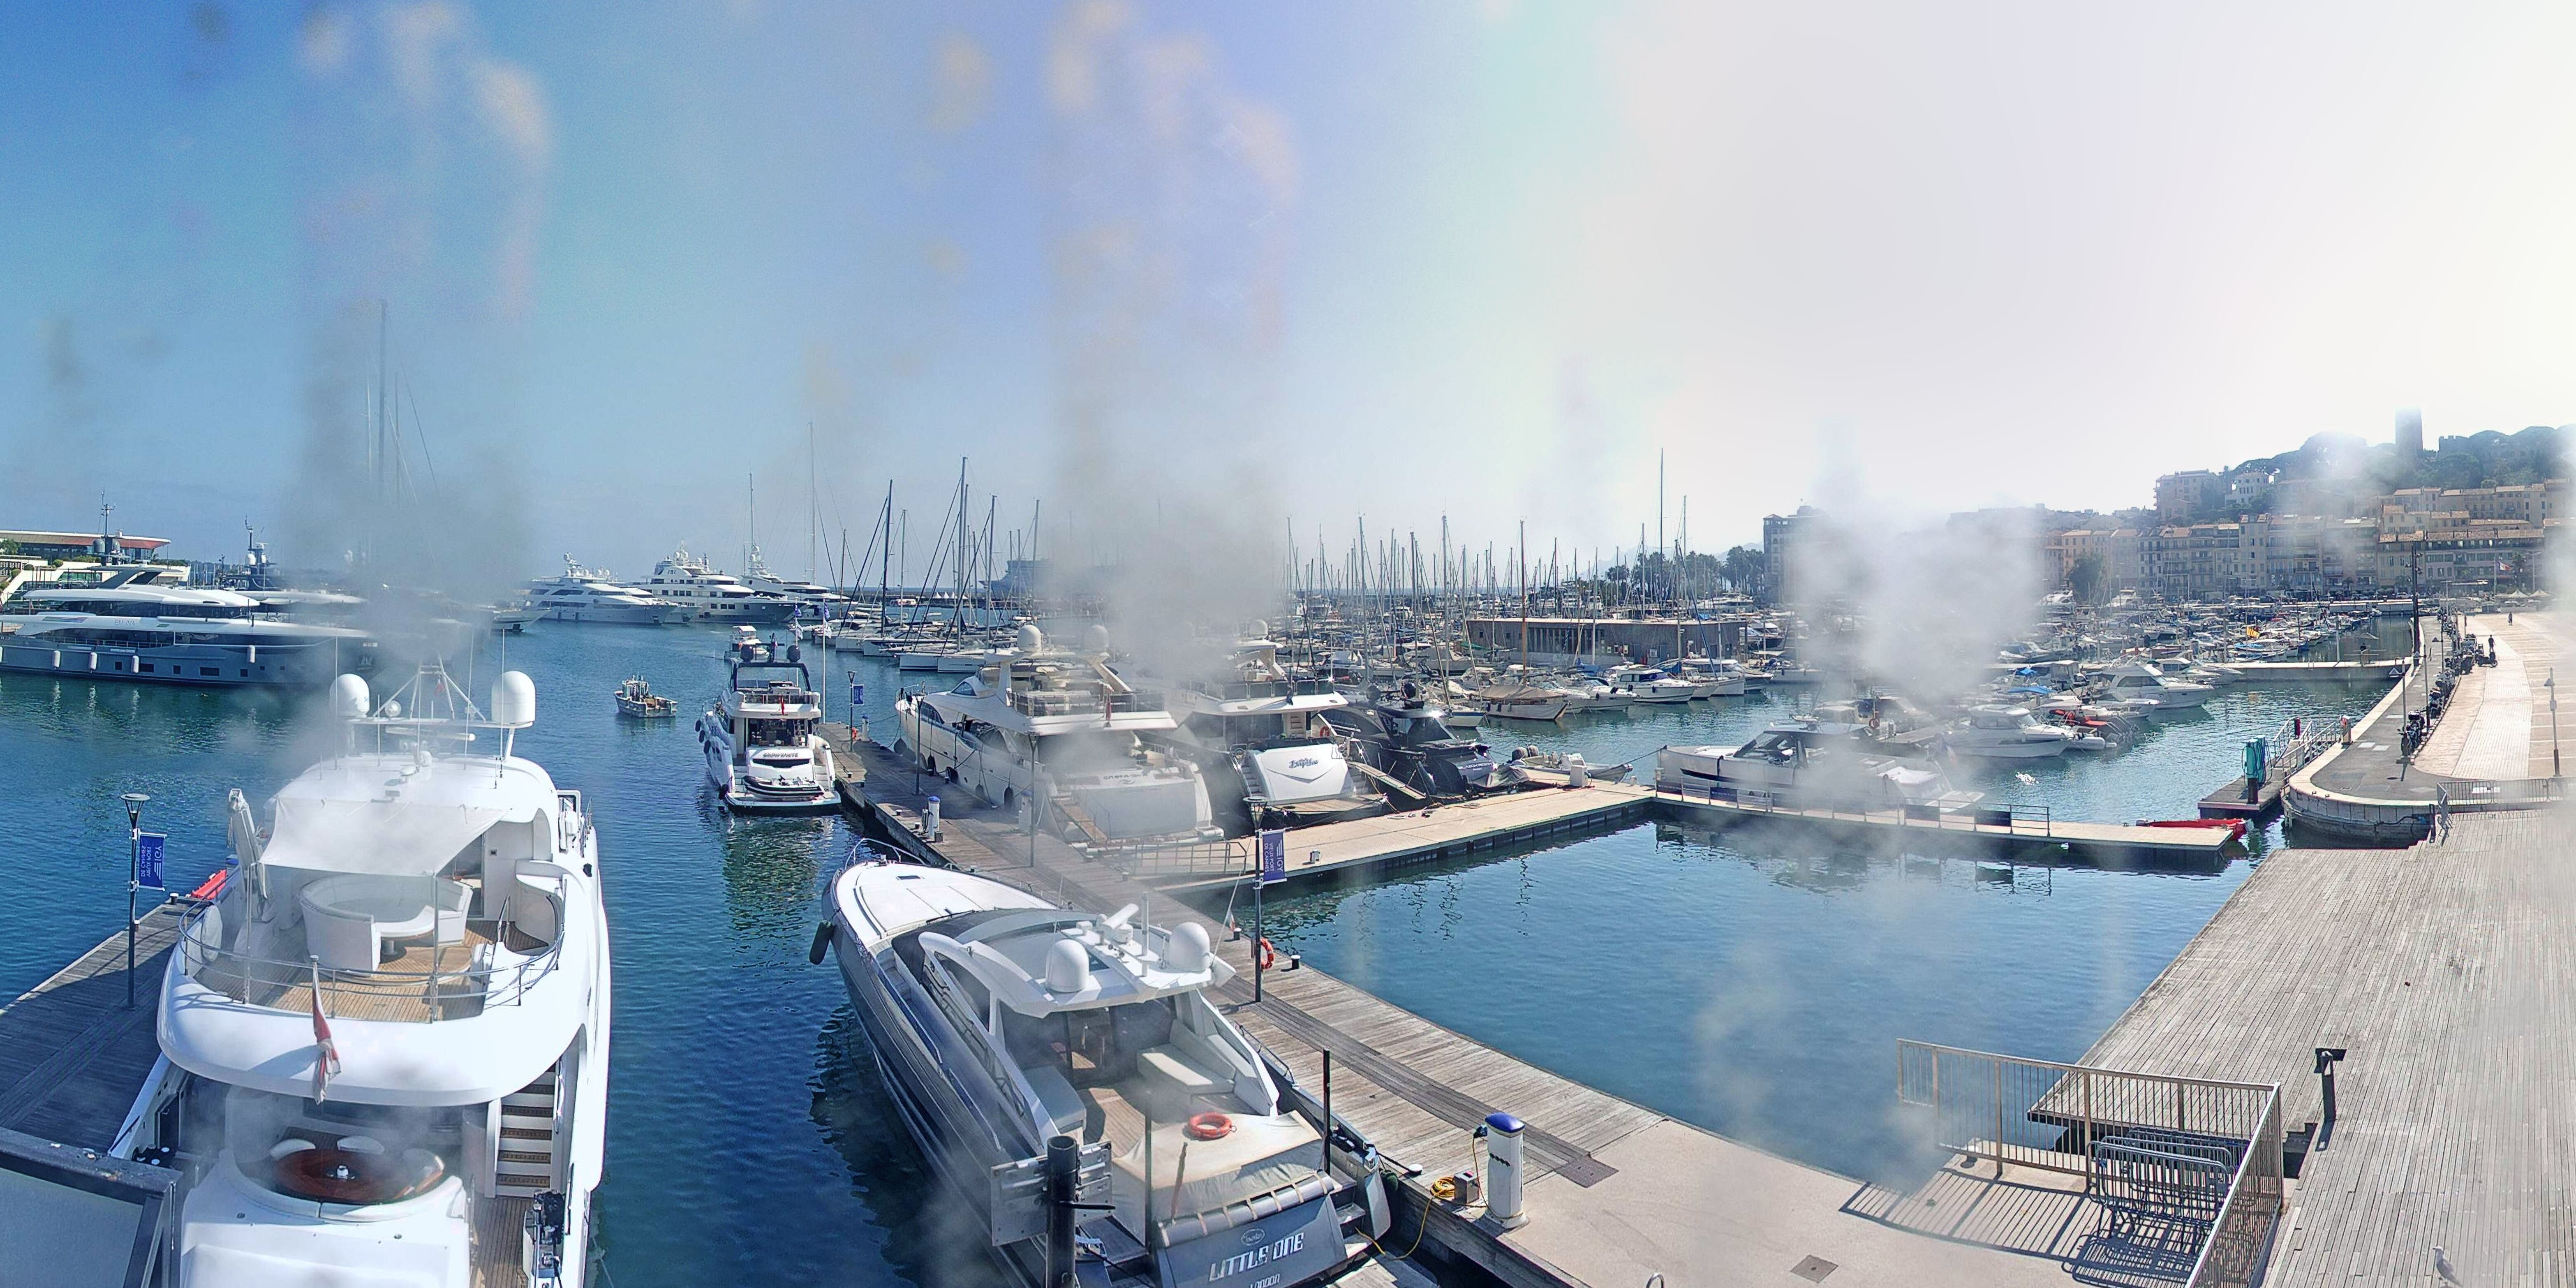 Cannes Thu. 18:35